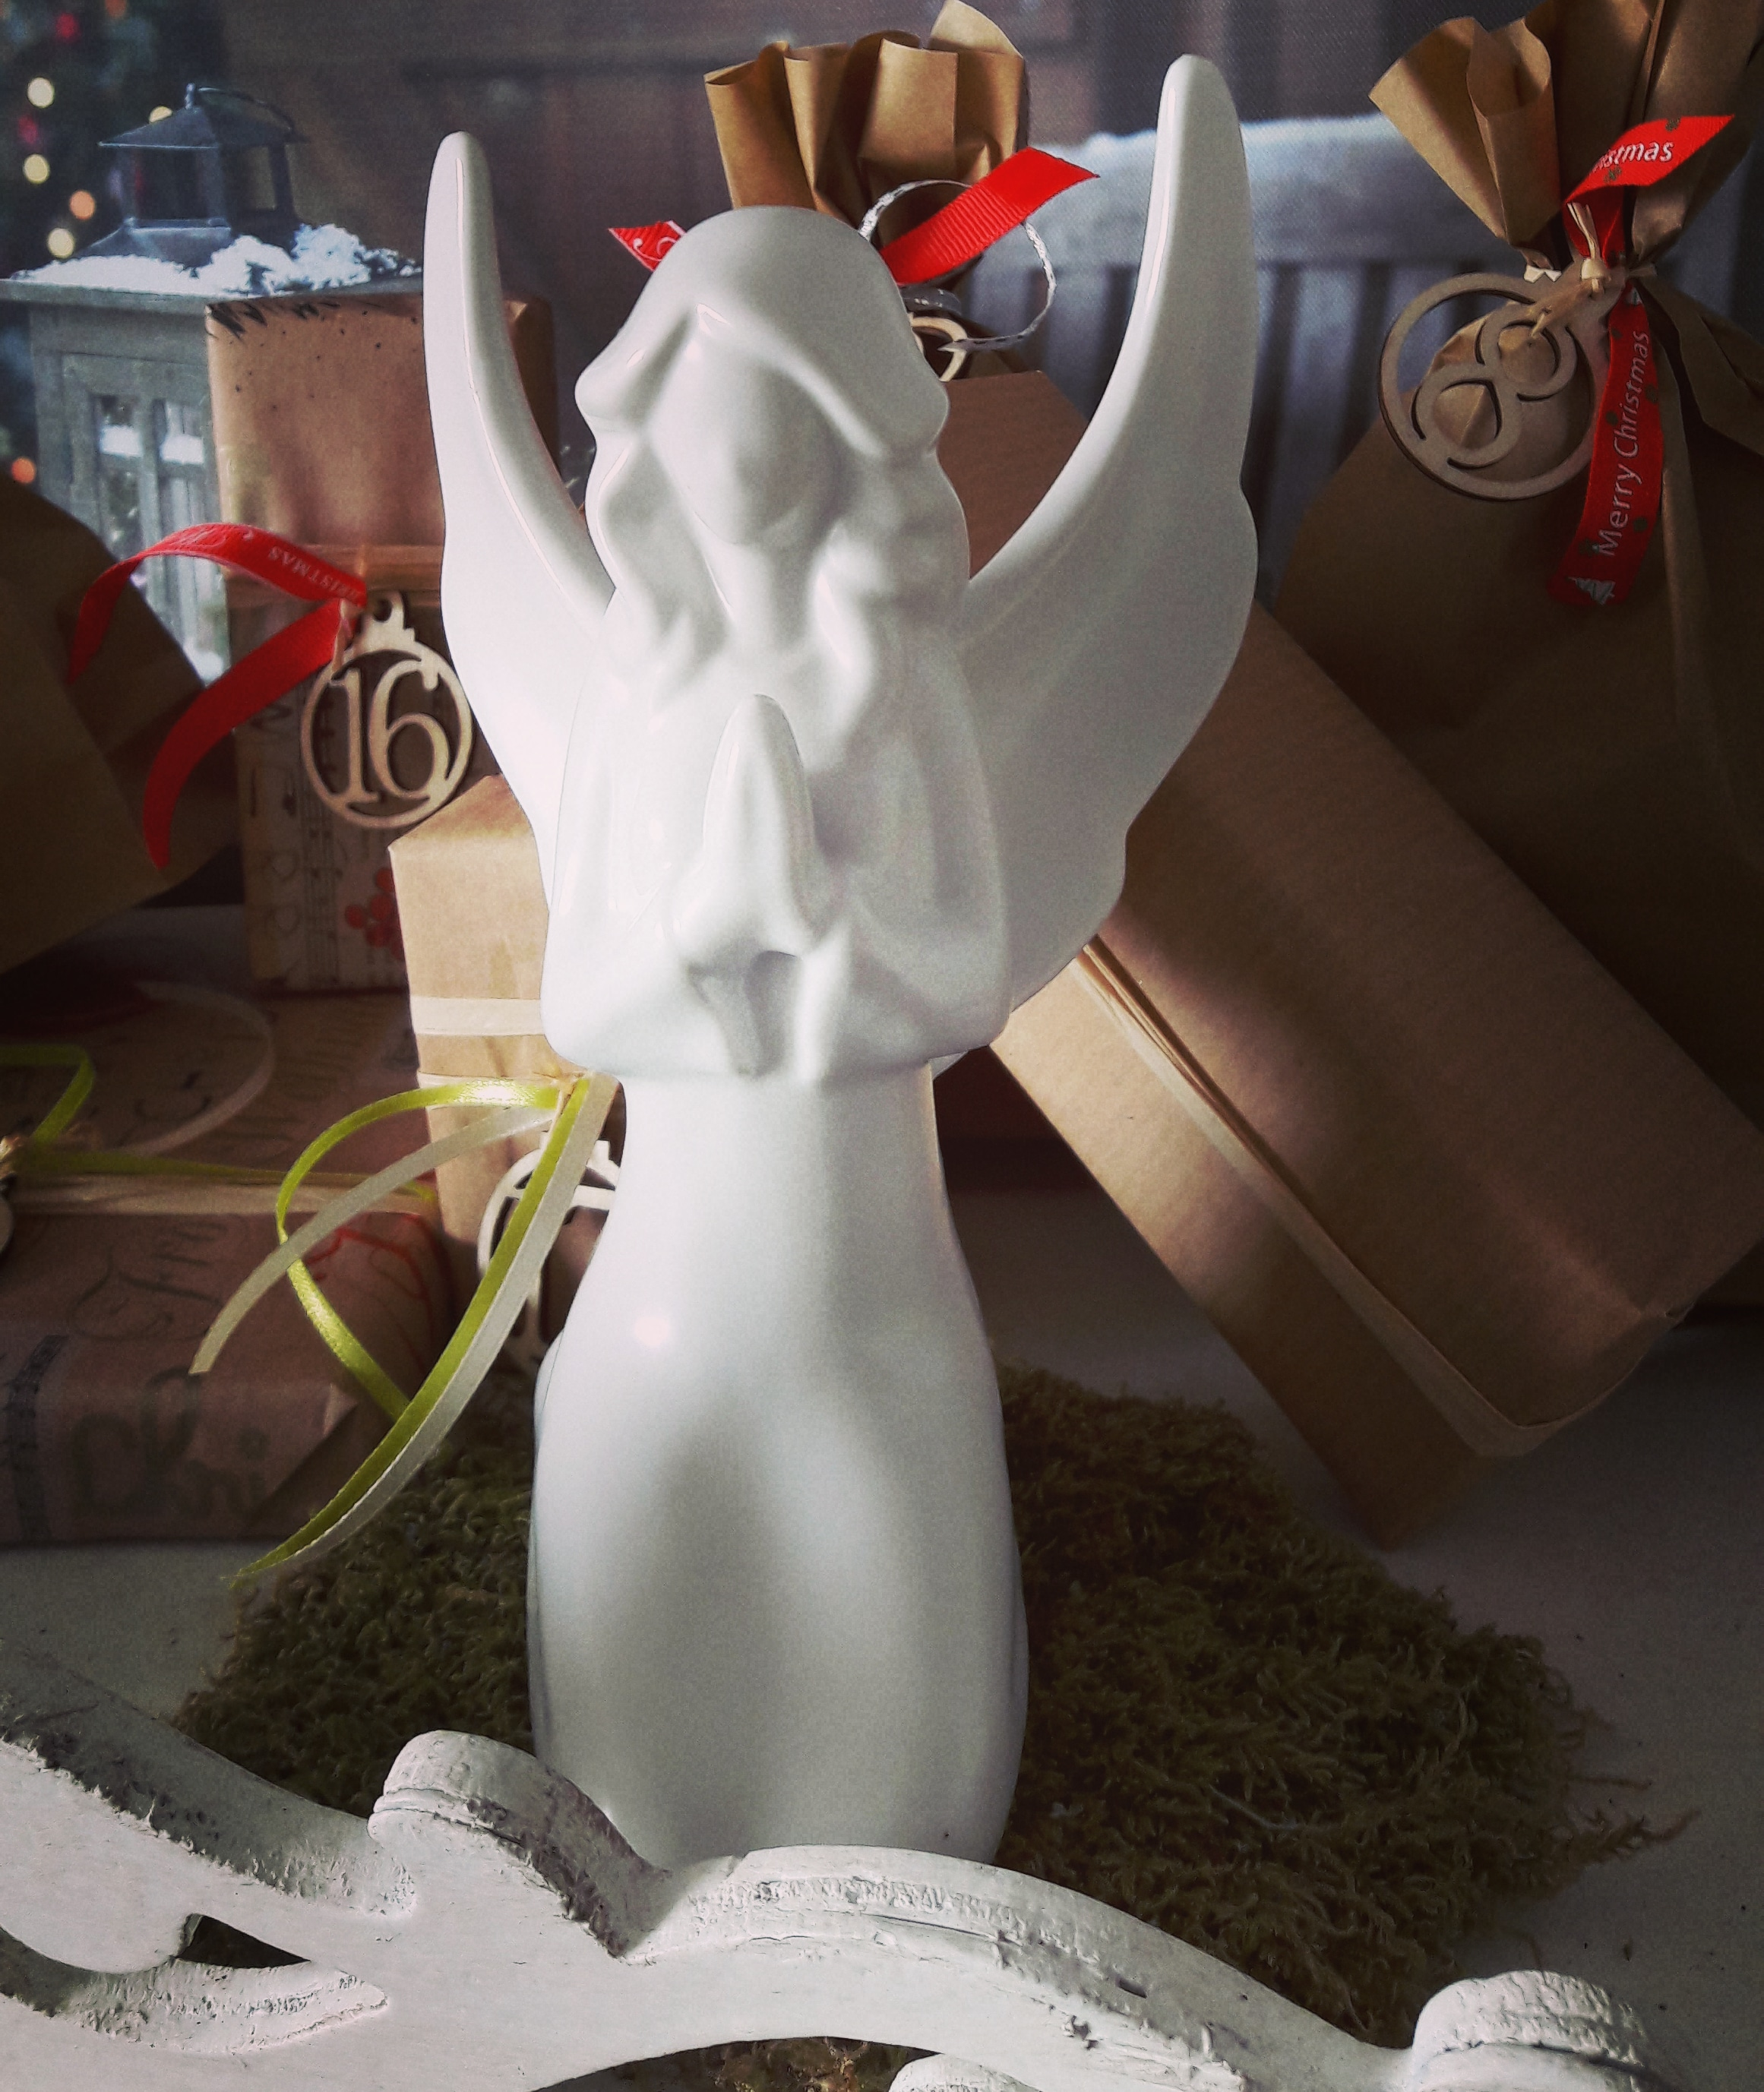 Engel Figur aus Porzellan